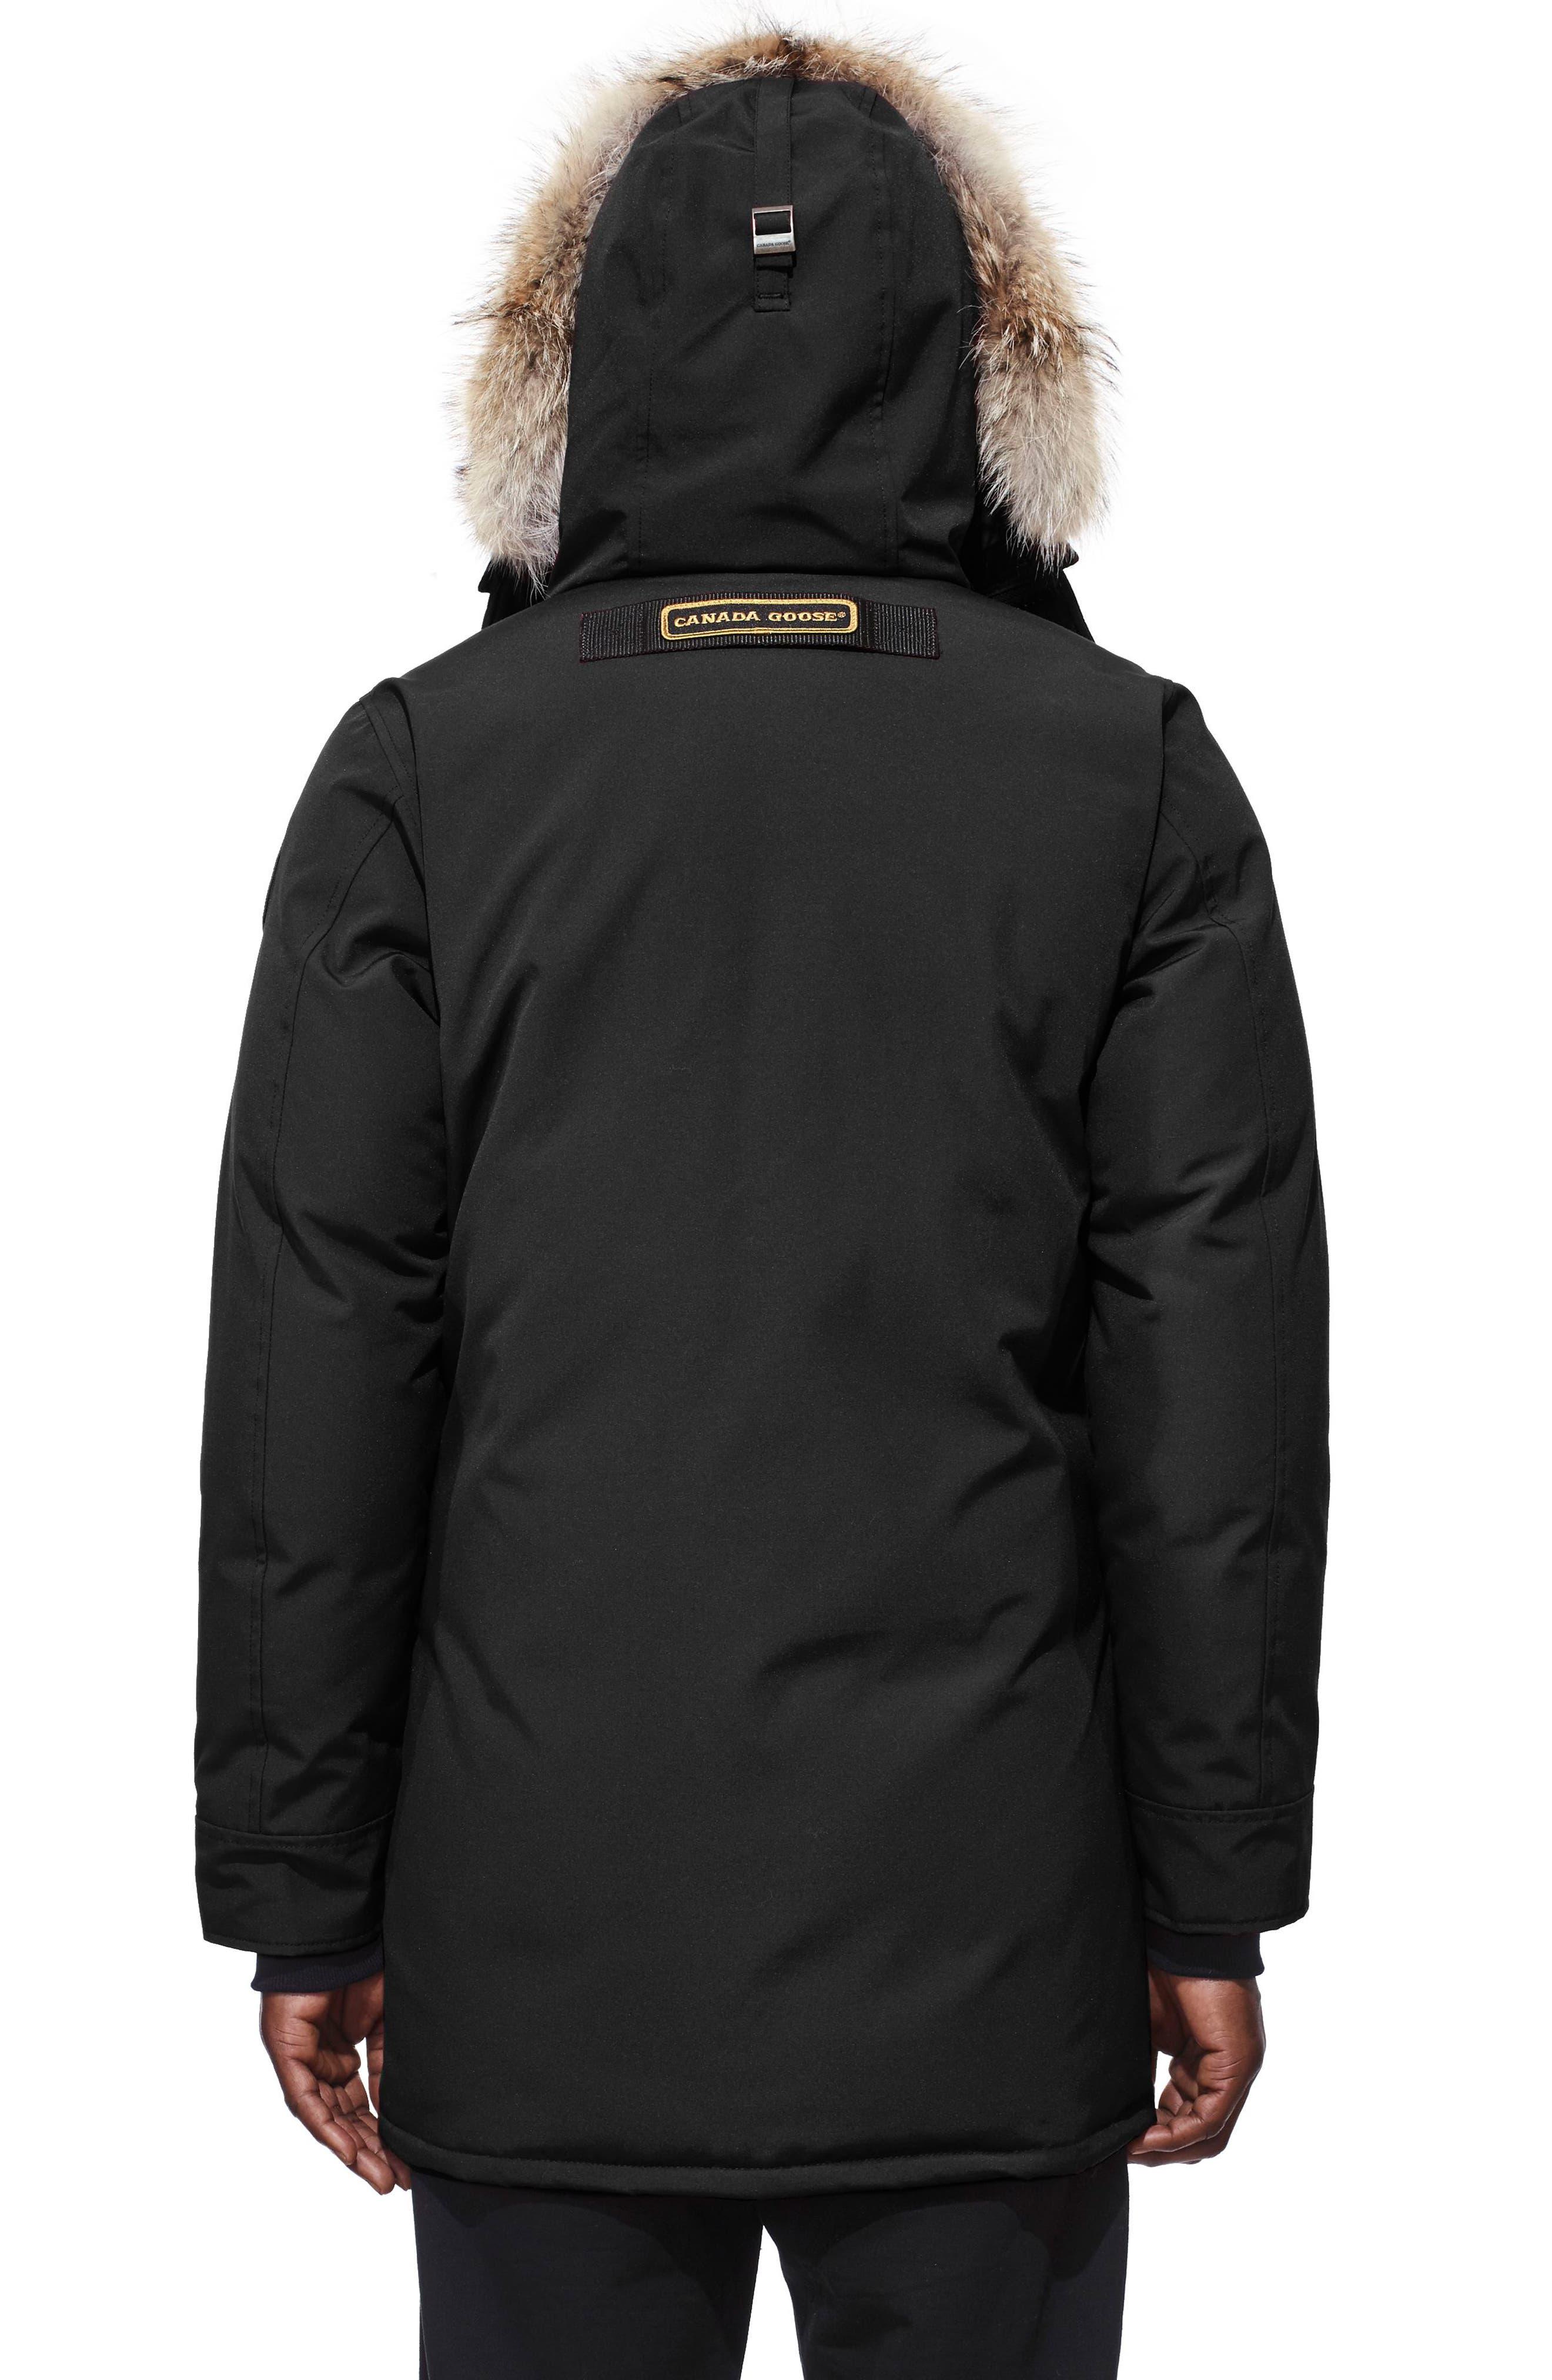 CANADA GOOSE, Langford Slim Fit Down Parka with Genuine Coyote Fur Trim, Alternate thumbnail 2, color, BLACK